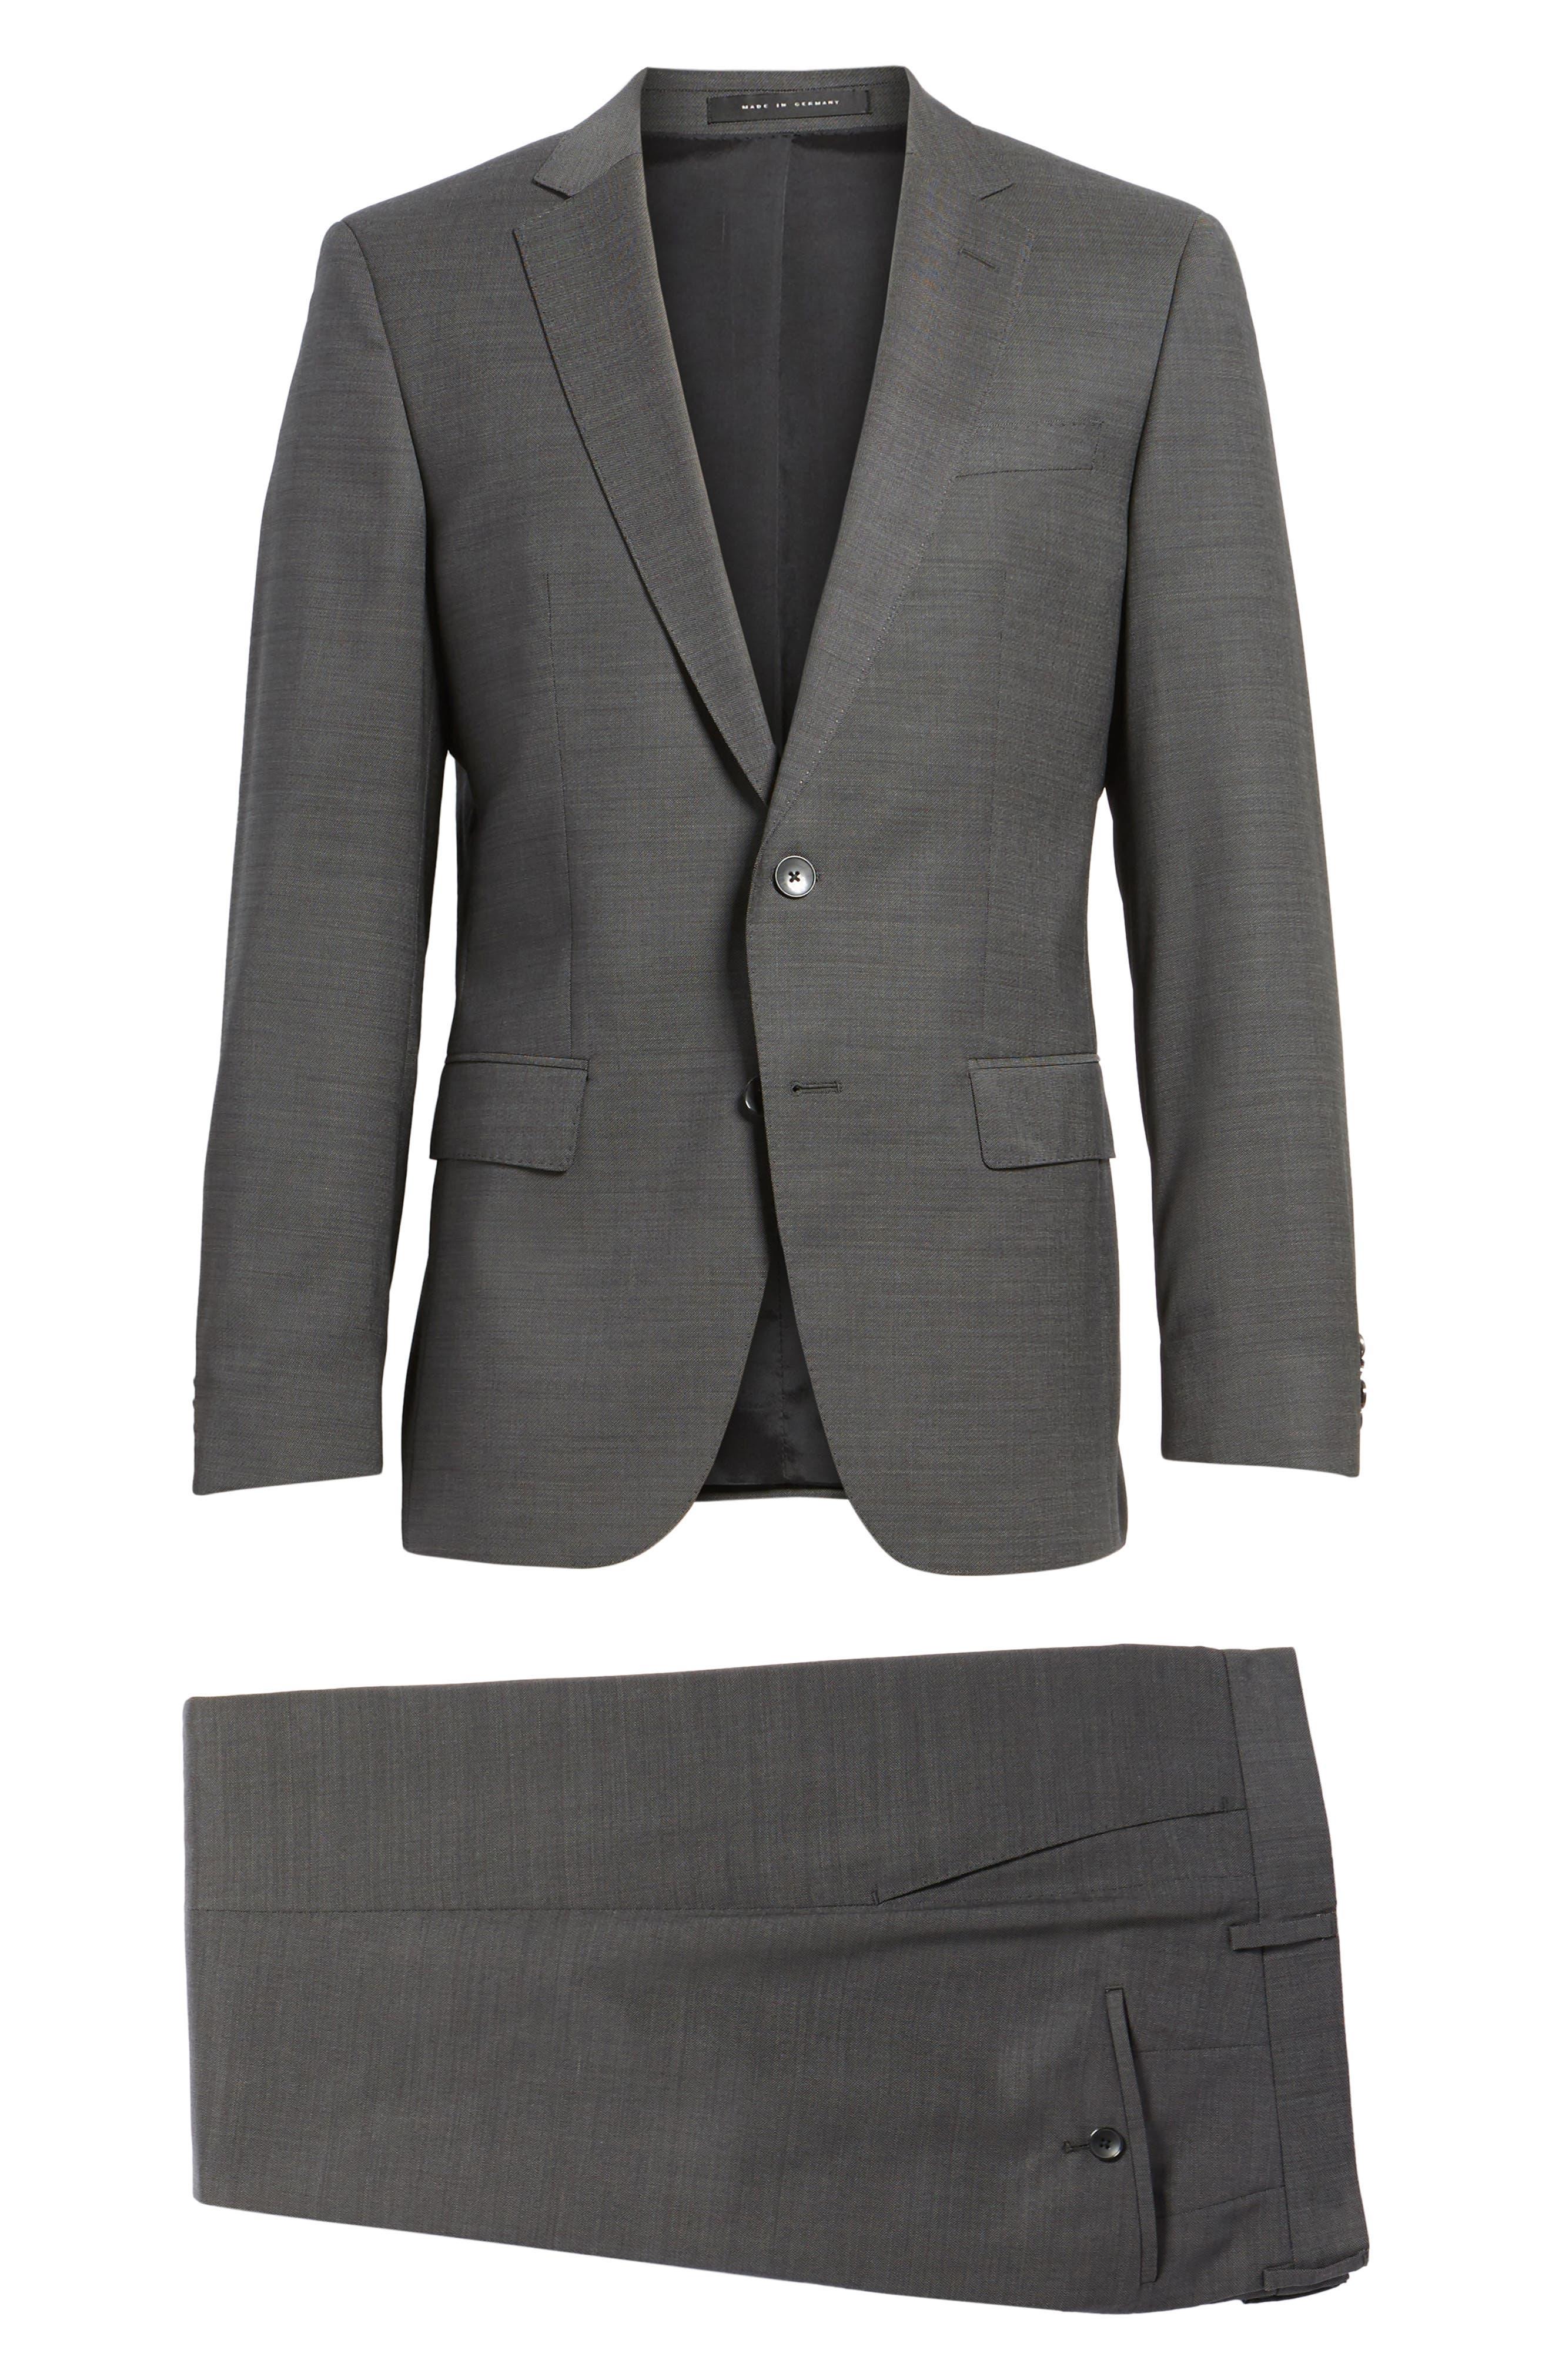 Huge/Genius Trim Fit Solid Wool Suit,                             Alternate thumbnail 8, color,                             Open Grey